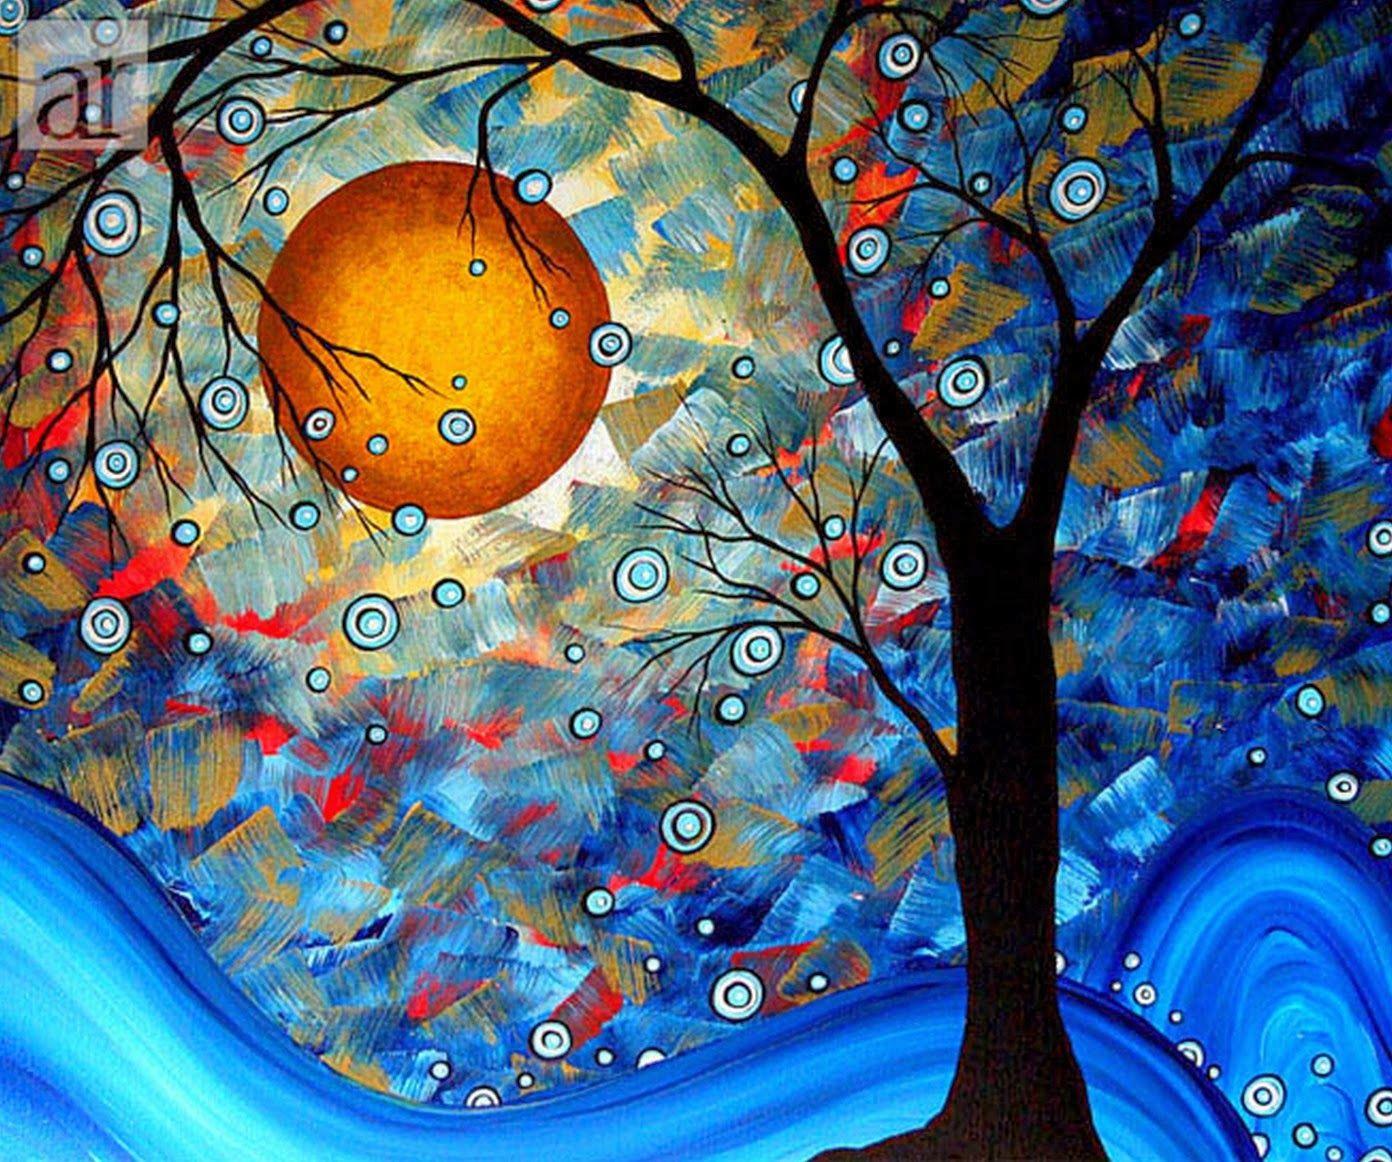 Pinturas figurativas bodegon buscar con google for Cuadros bonitos y modernos